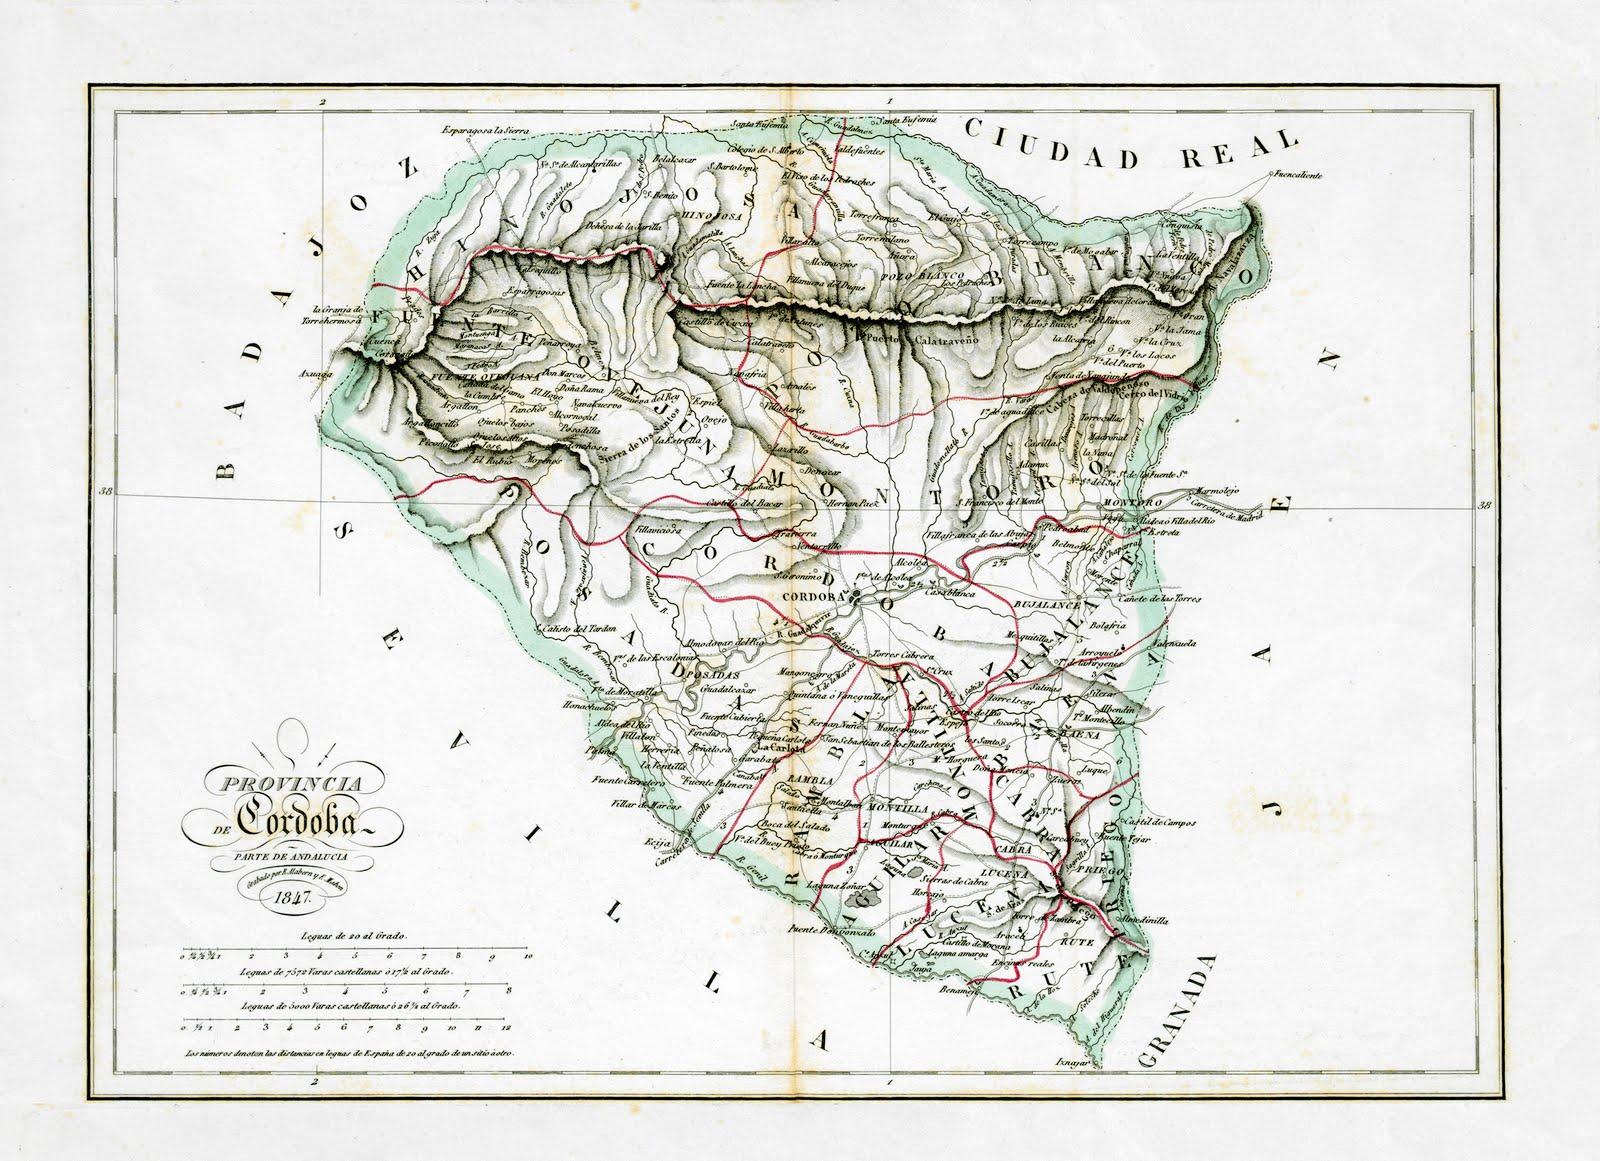 Provincia de Córdoba en 1847